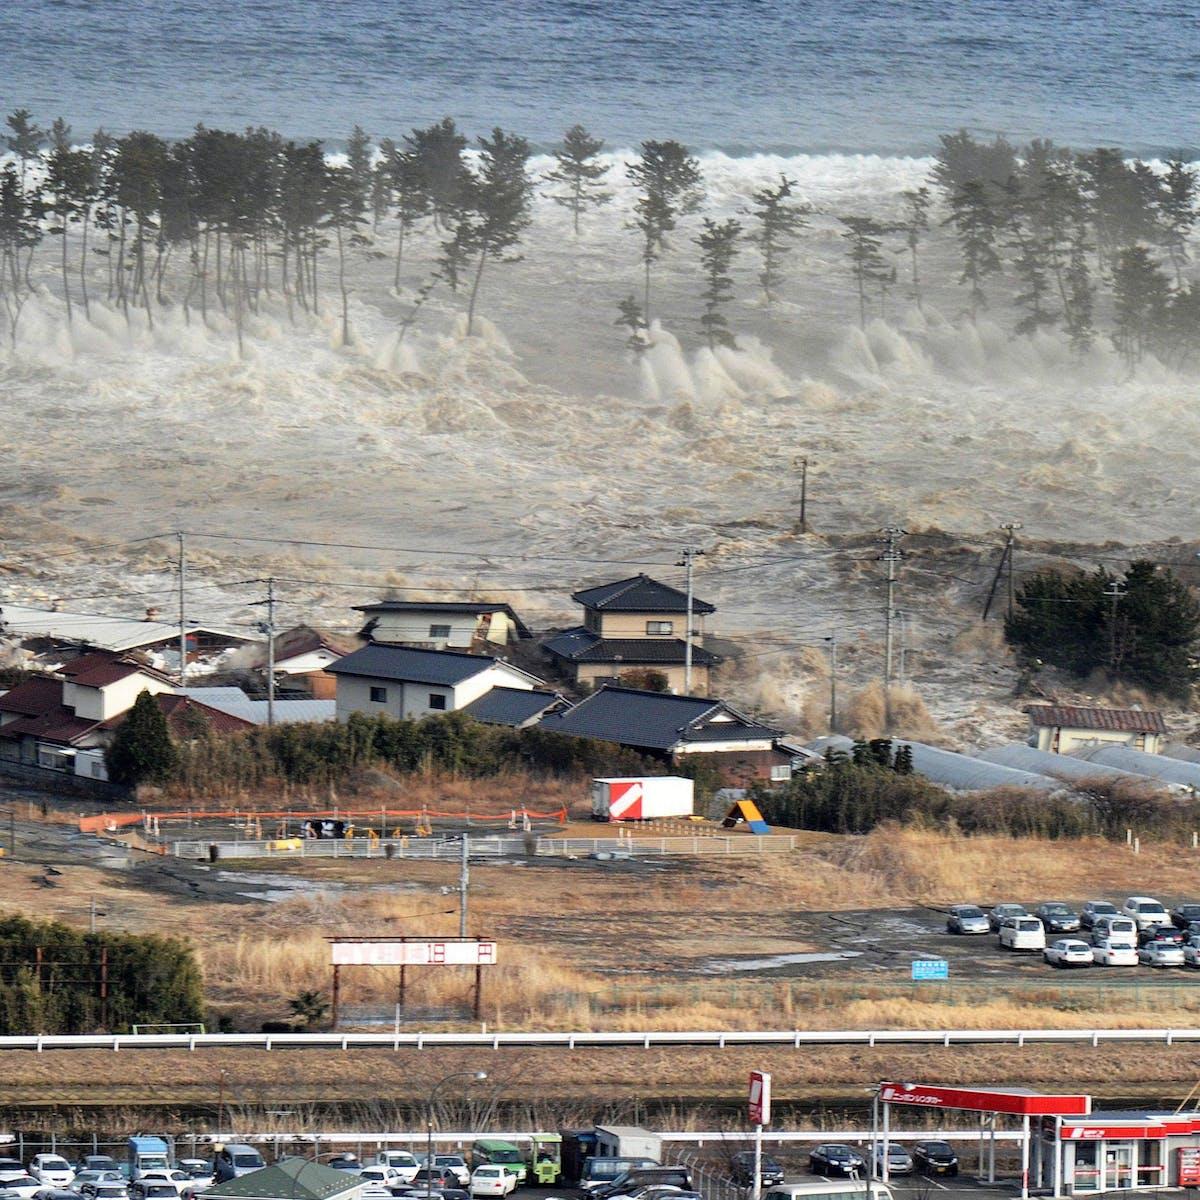 We should have been prepared for the Fukushima tsunami